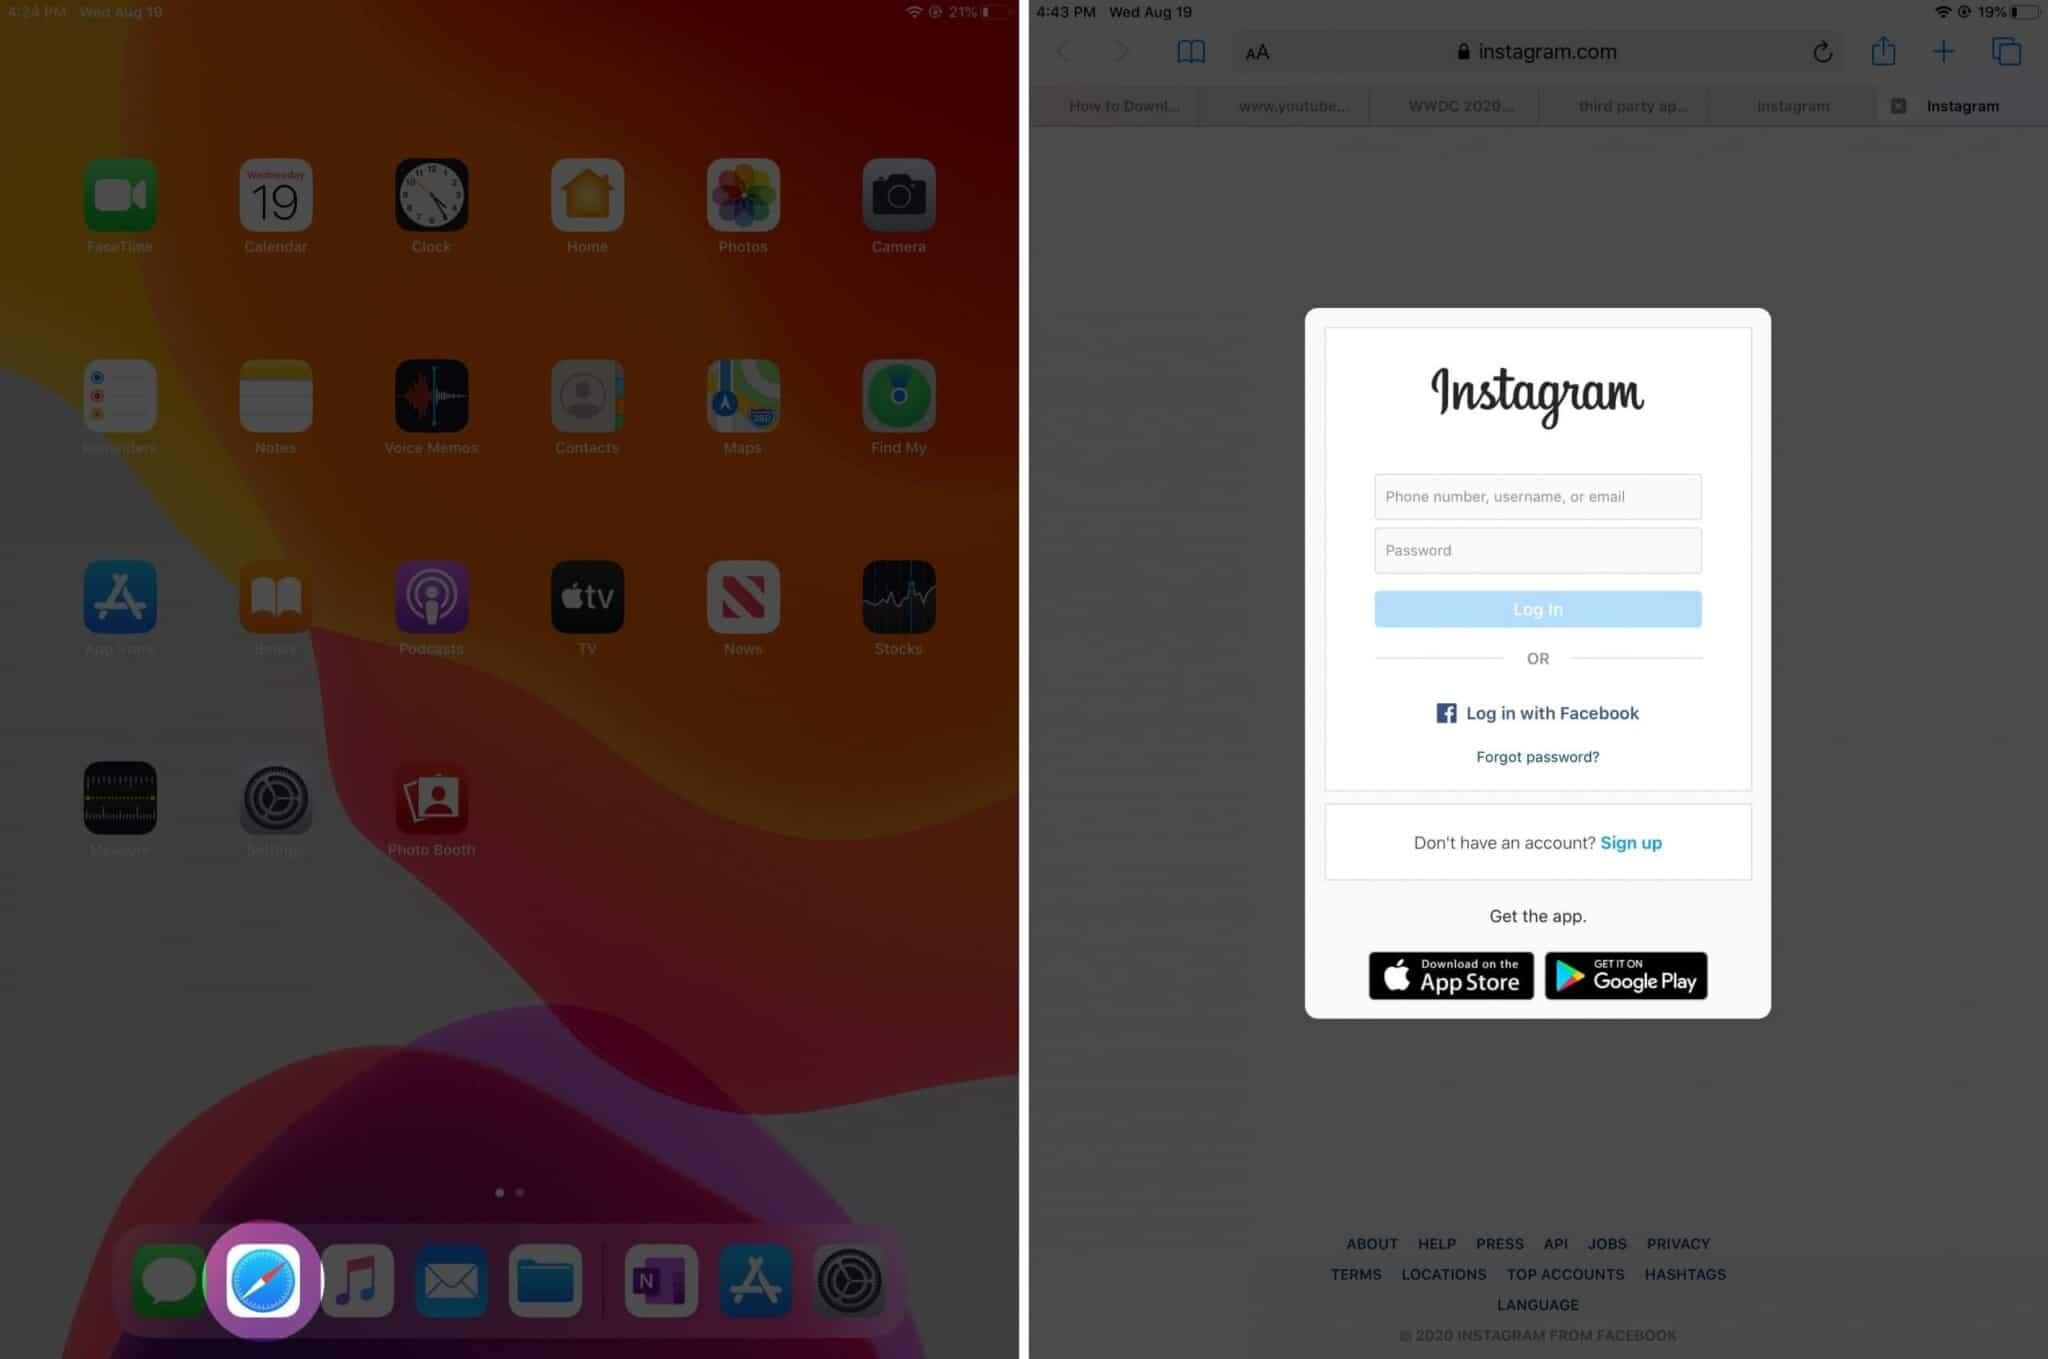 open safari app and login to instagram on ipad